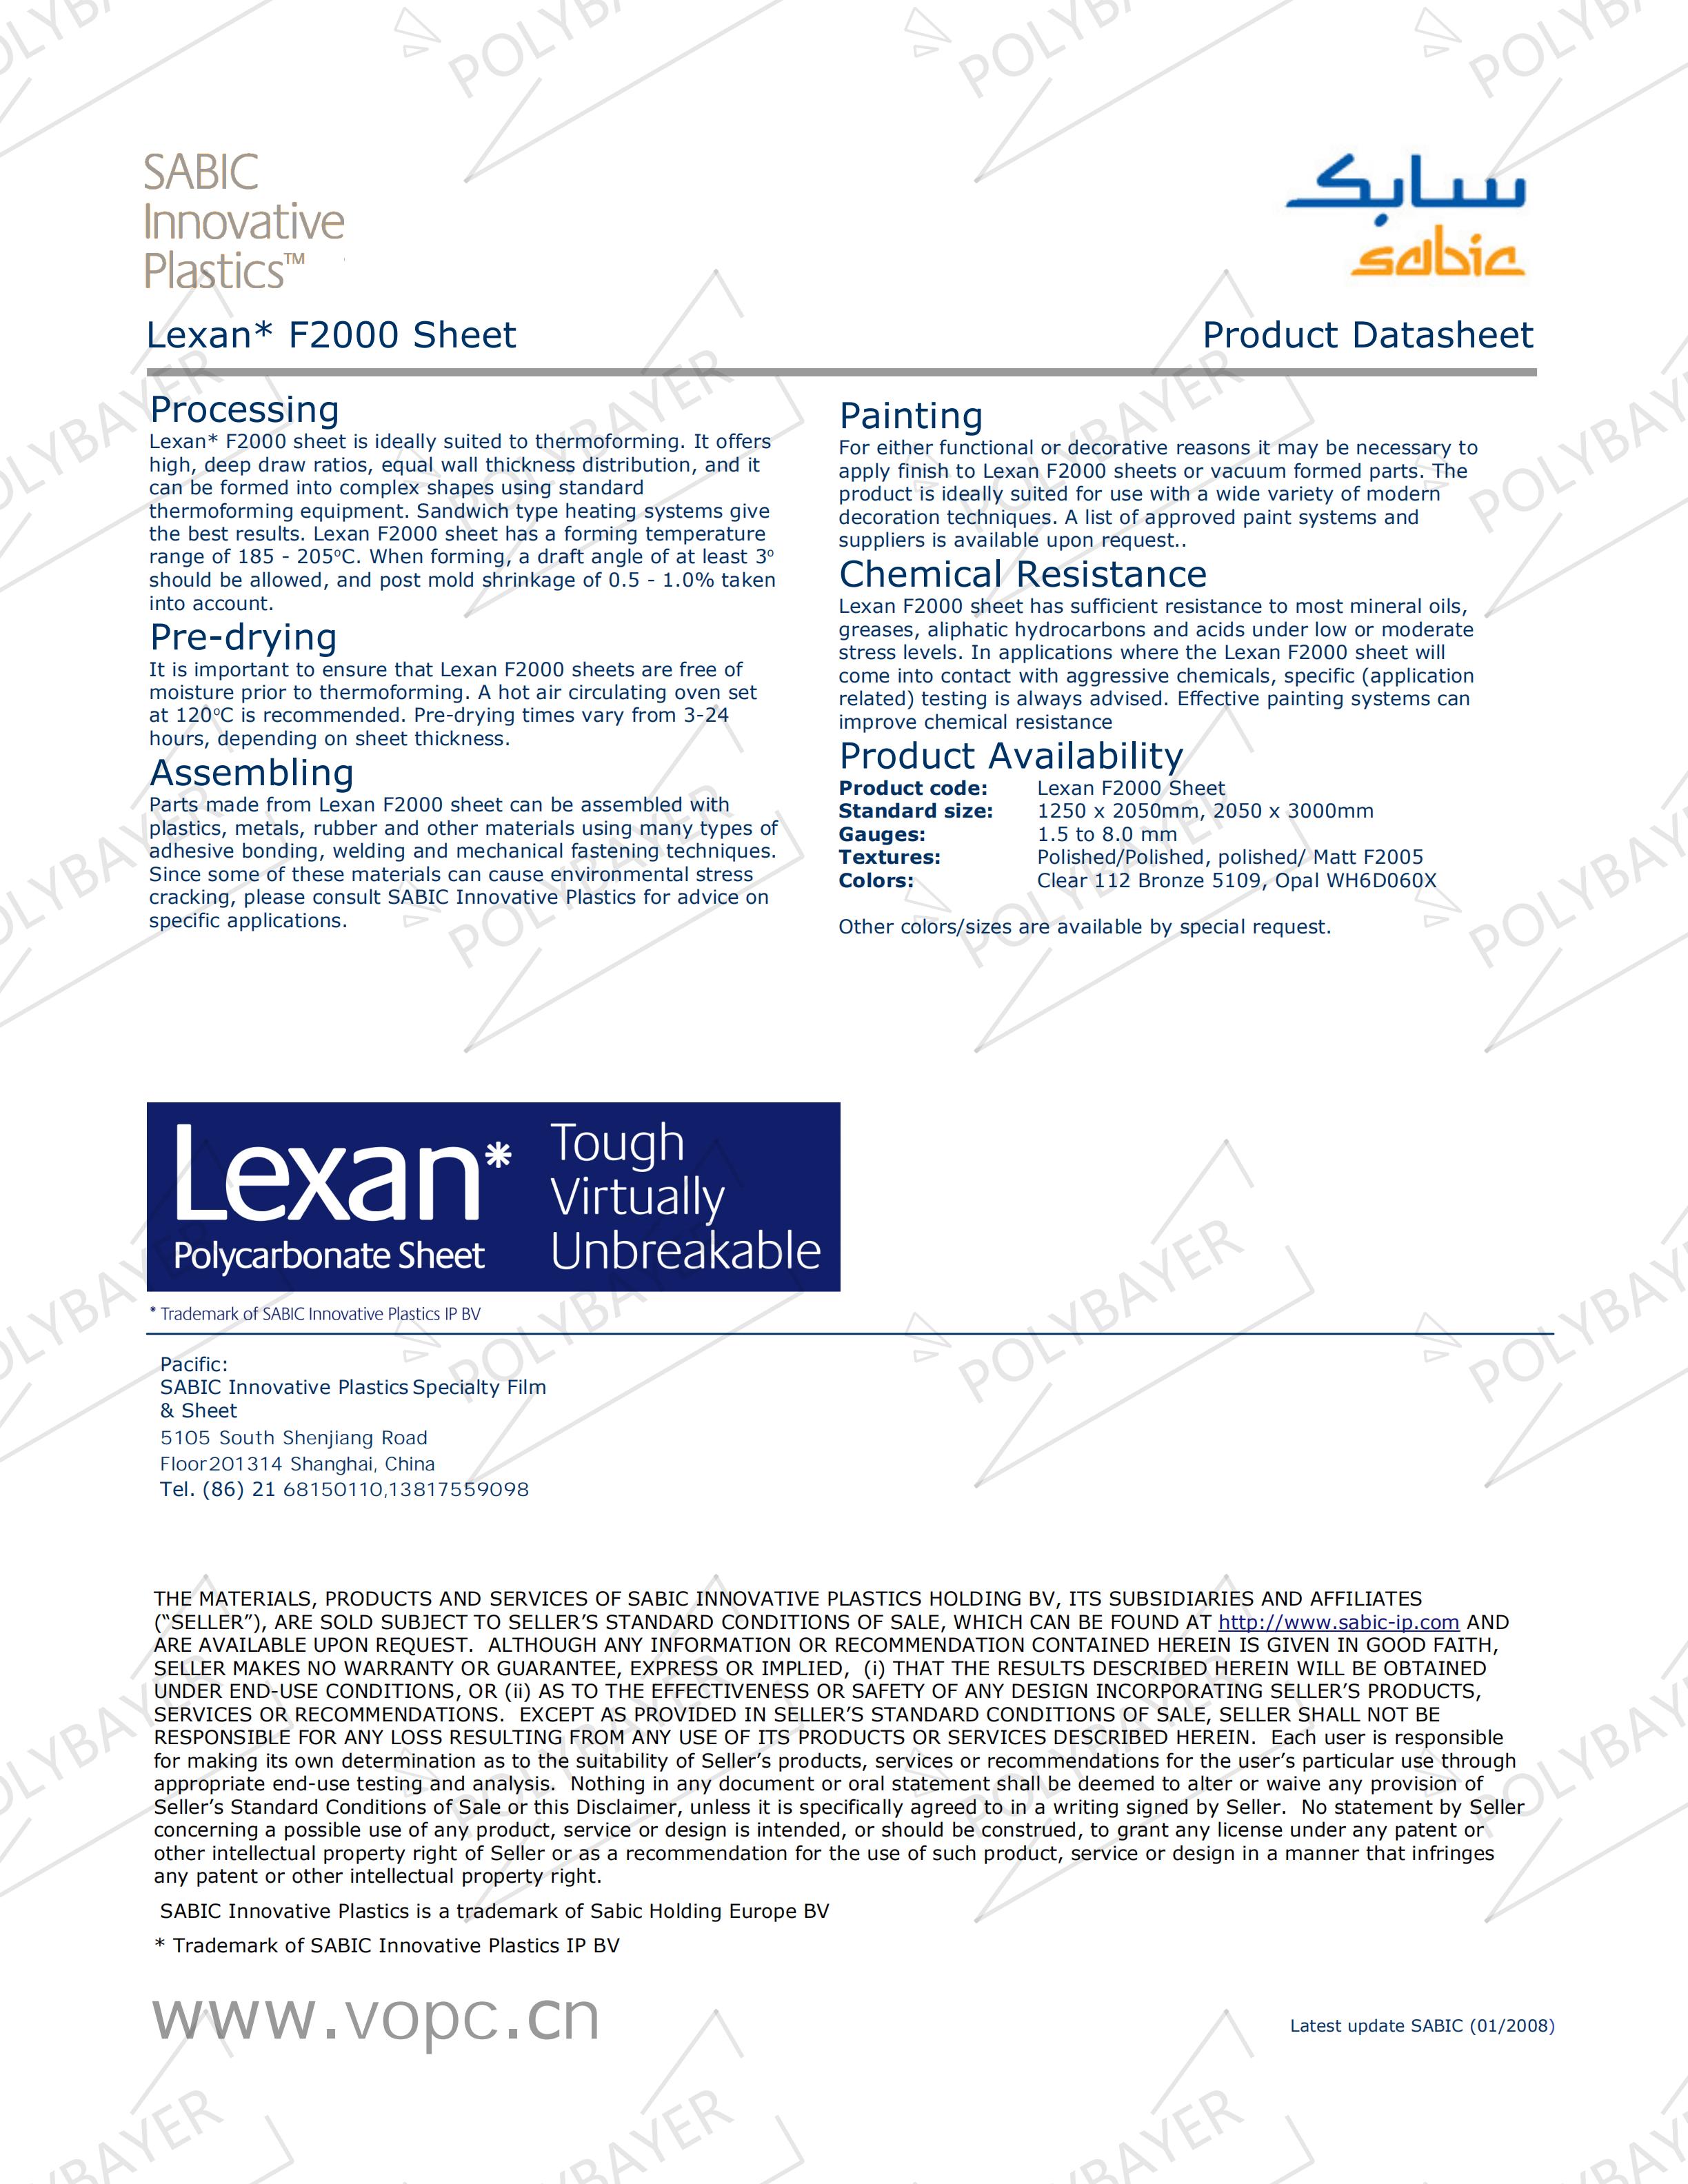 V0级阻燃PC板,Lexan F2000 sheet-SABIC,F2000,沙伯F2000,Lexan F2000聚碳酸酯板UL94检测报告,V0防火检测属性参数,F2000物性参数表图2